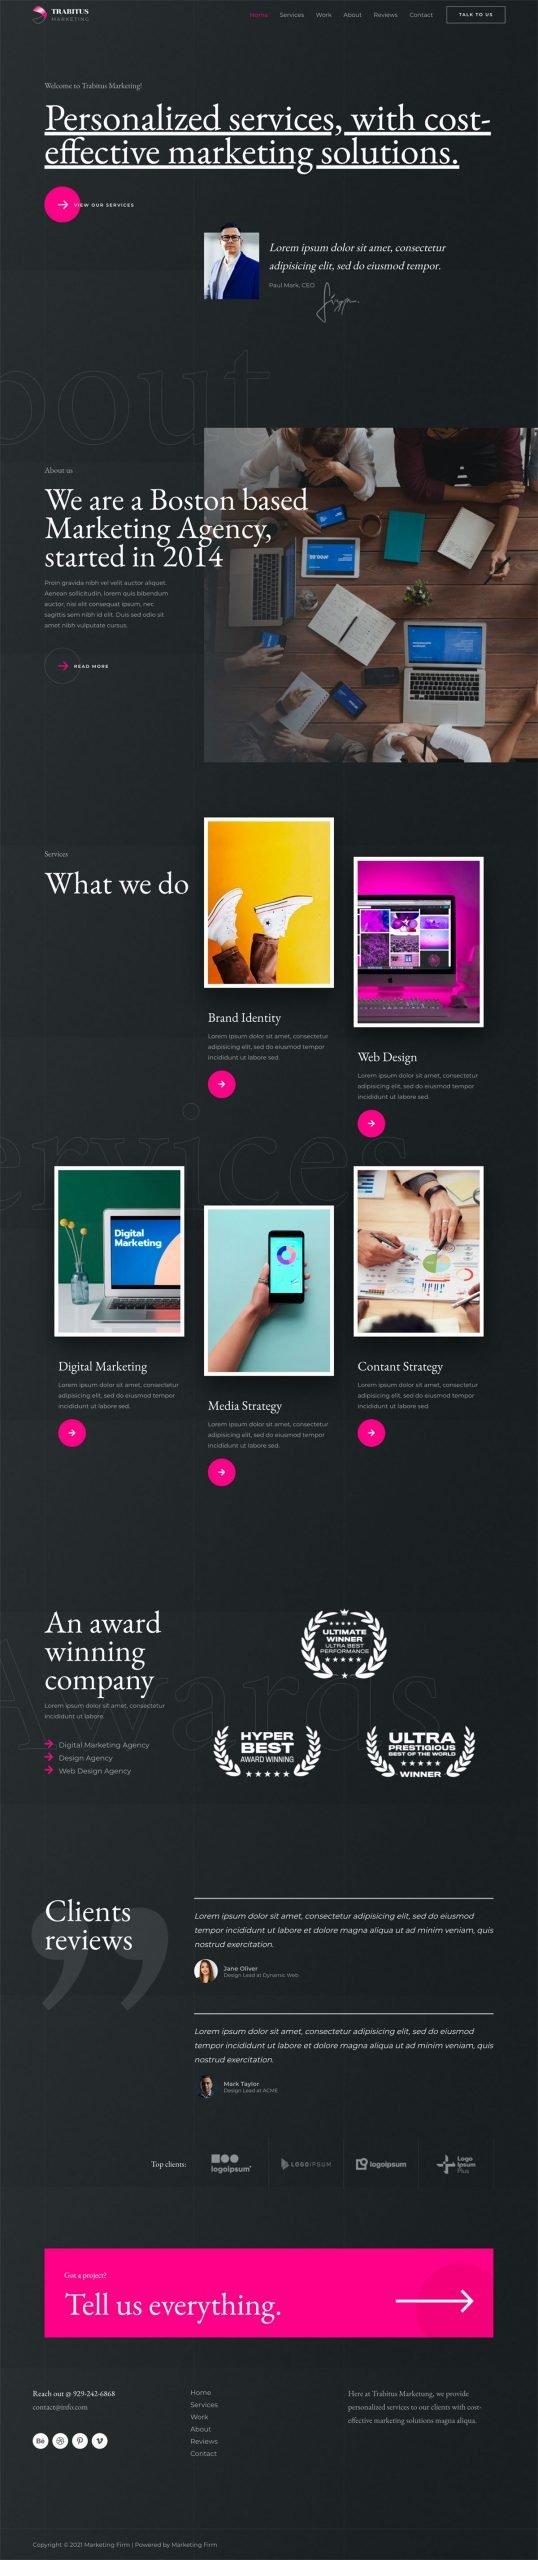 Adamo Web Design | Web Design Durham | marketing firm 04 home scaled